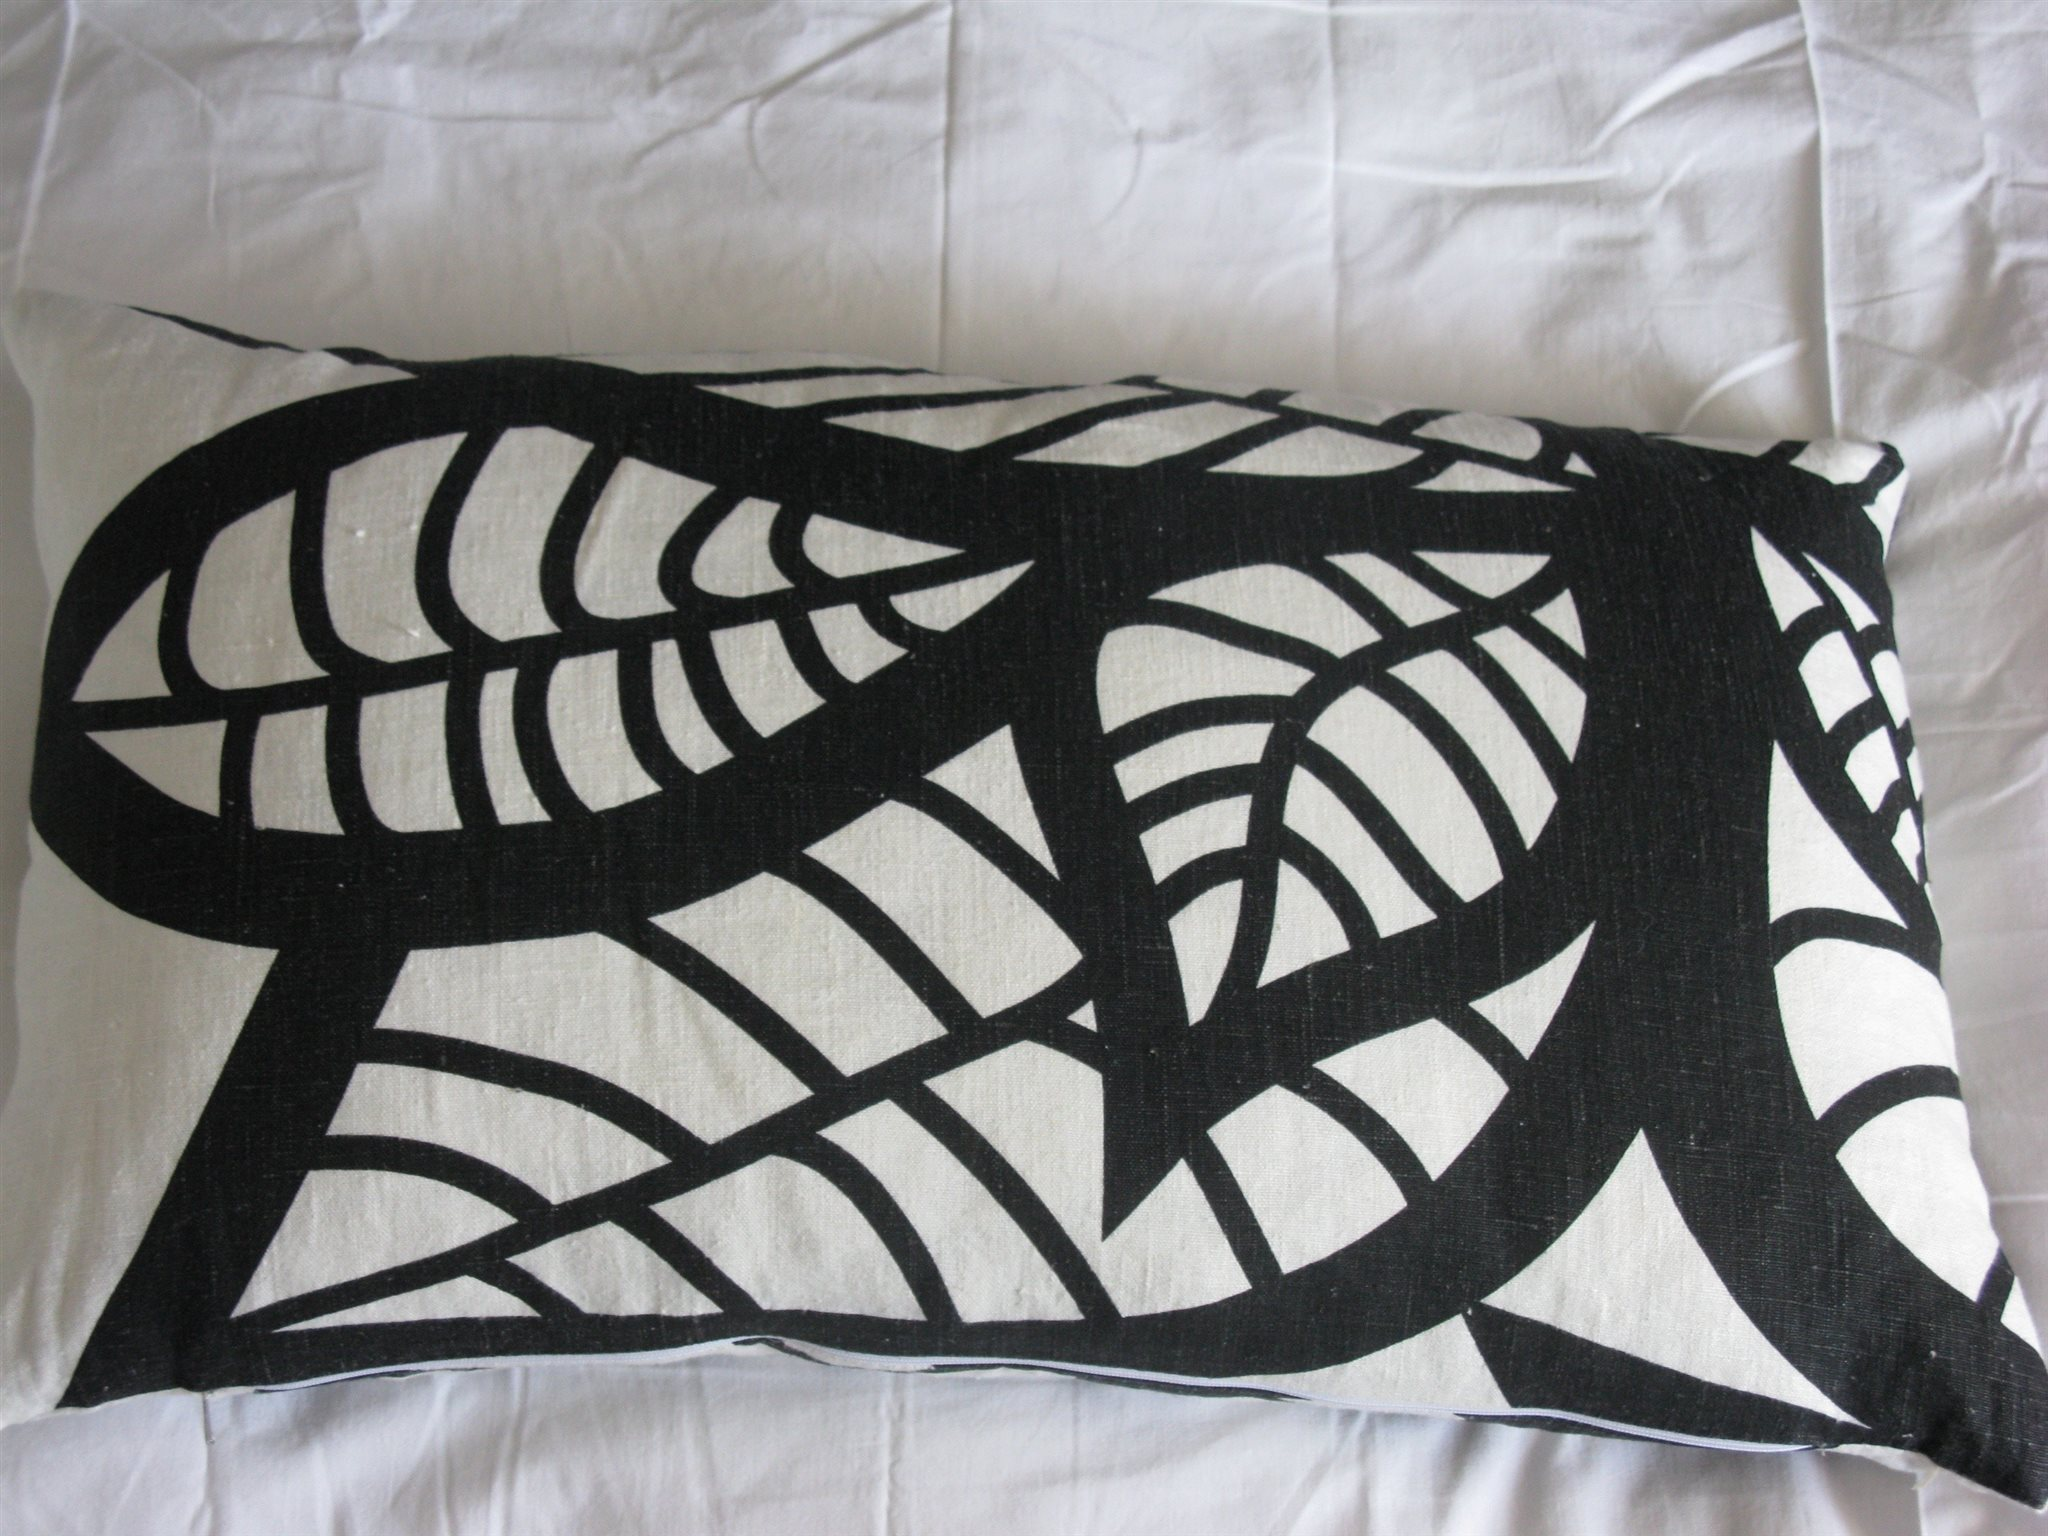 latest mairo hosta stor kudde i lin med innerkudde i dun mario svartvit  kudde with svart vit kudde 0b266446e8a13